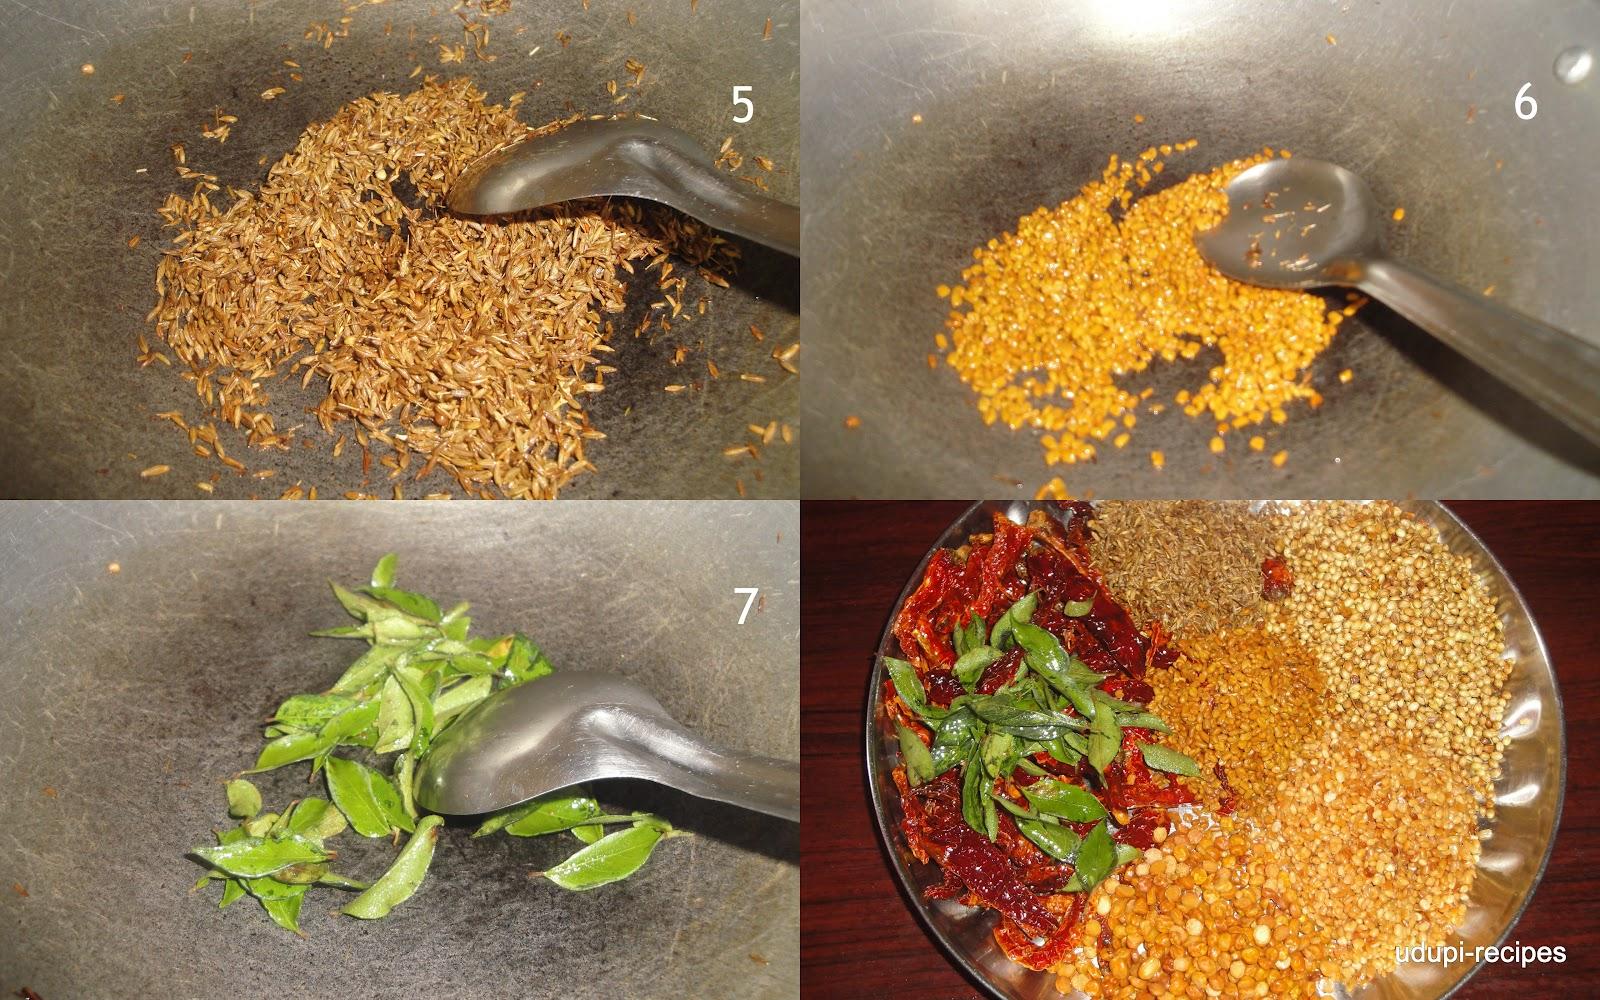 Udupi Sambar Powder Recipe How to make sambar powder?Udupi